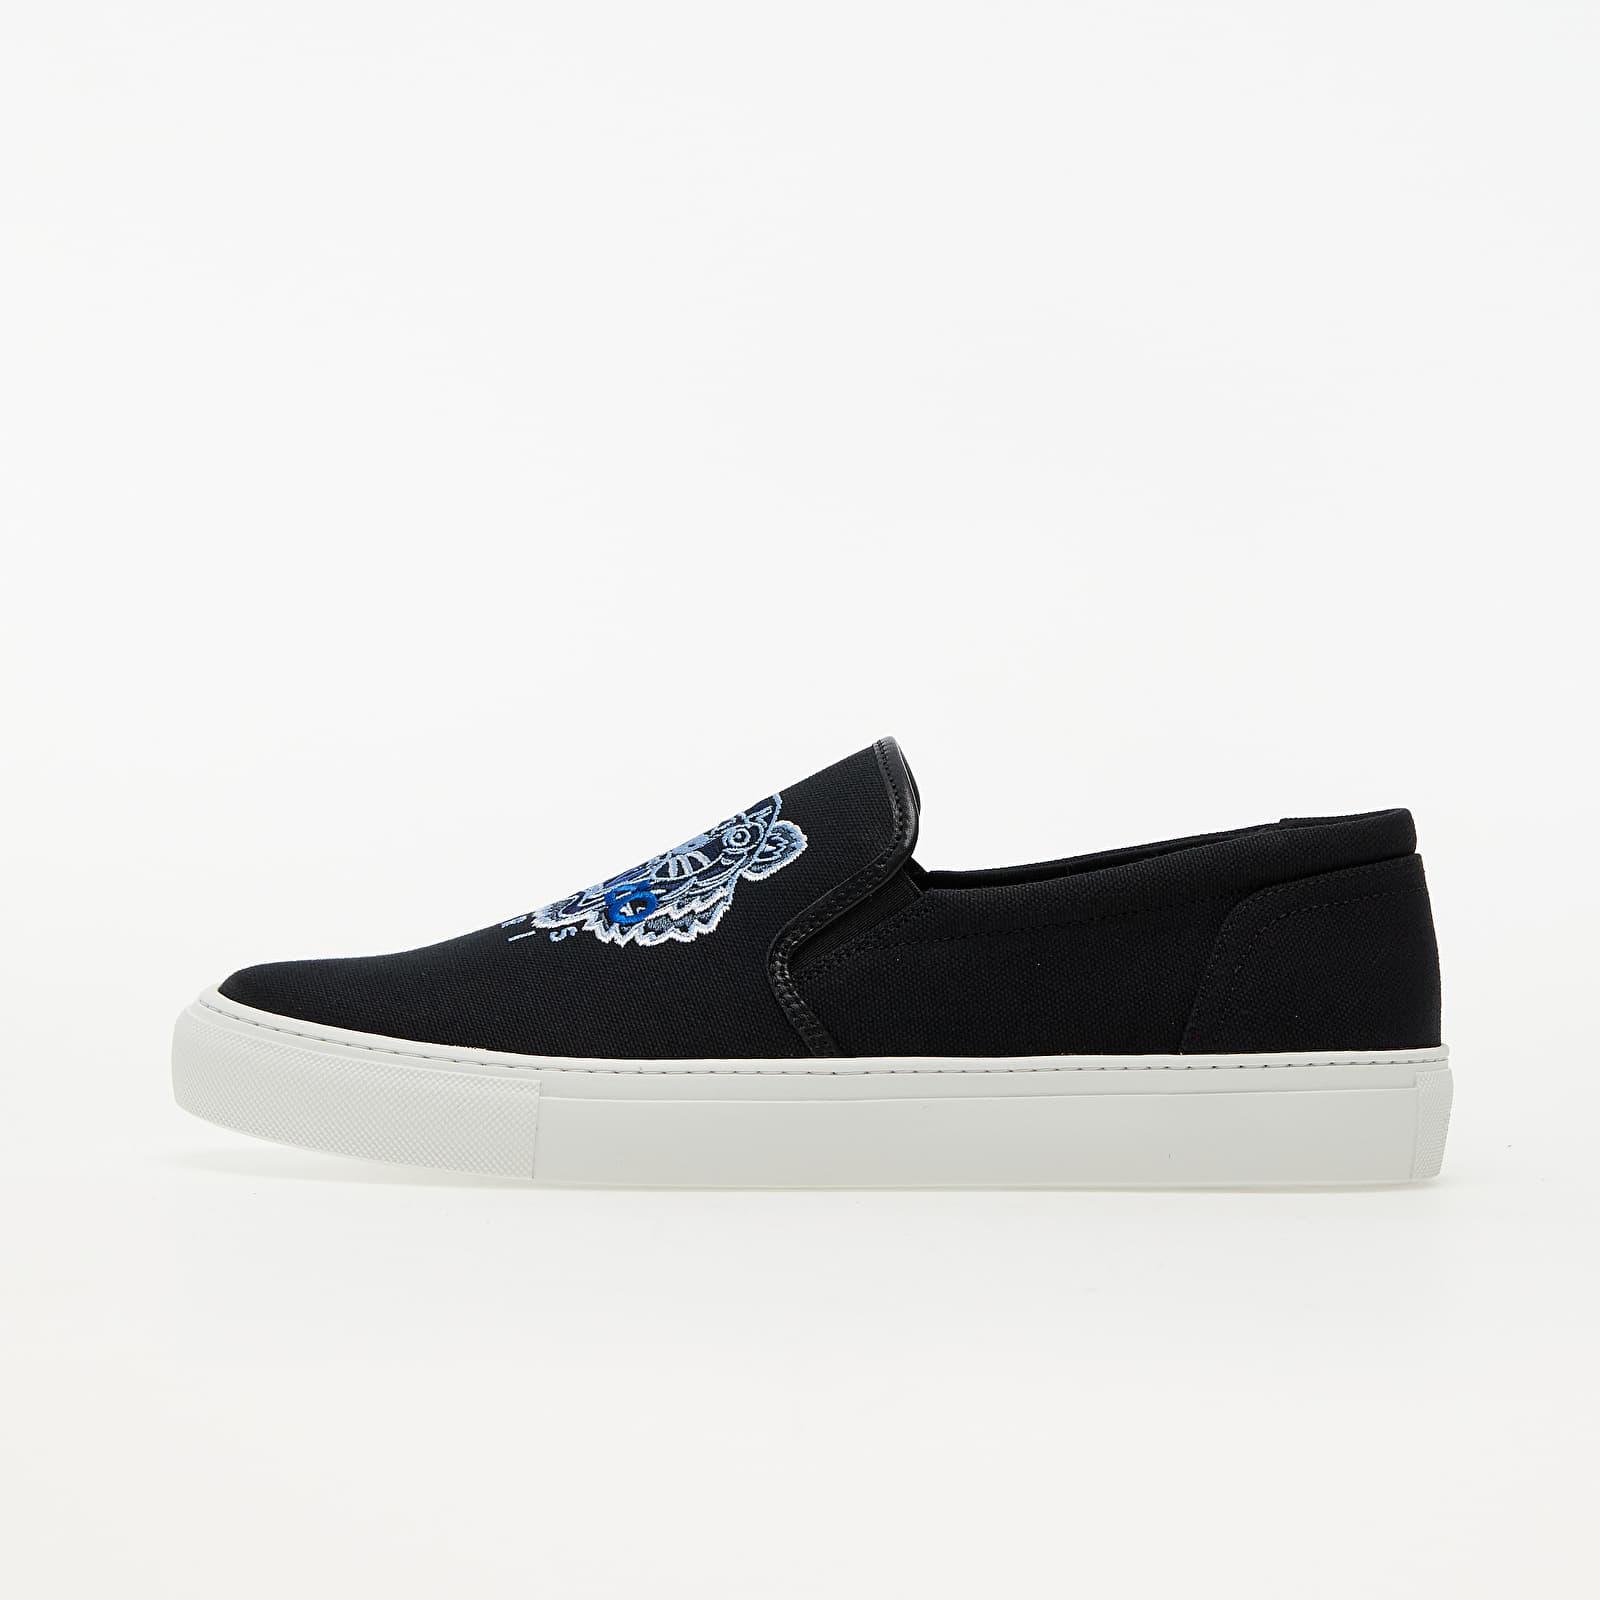 Kenzo Slip-on sneaker Black FB55SN100F70.99